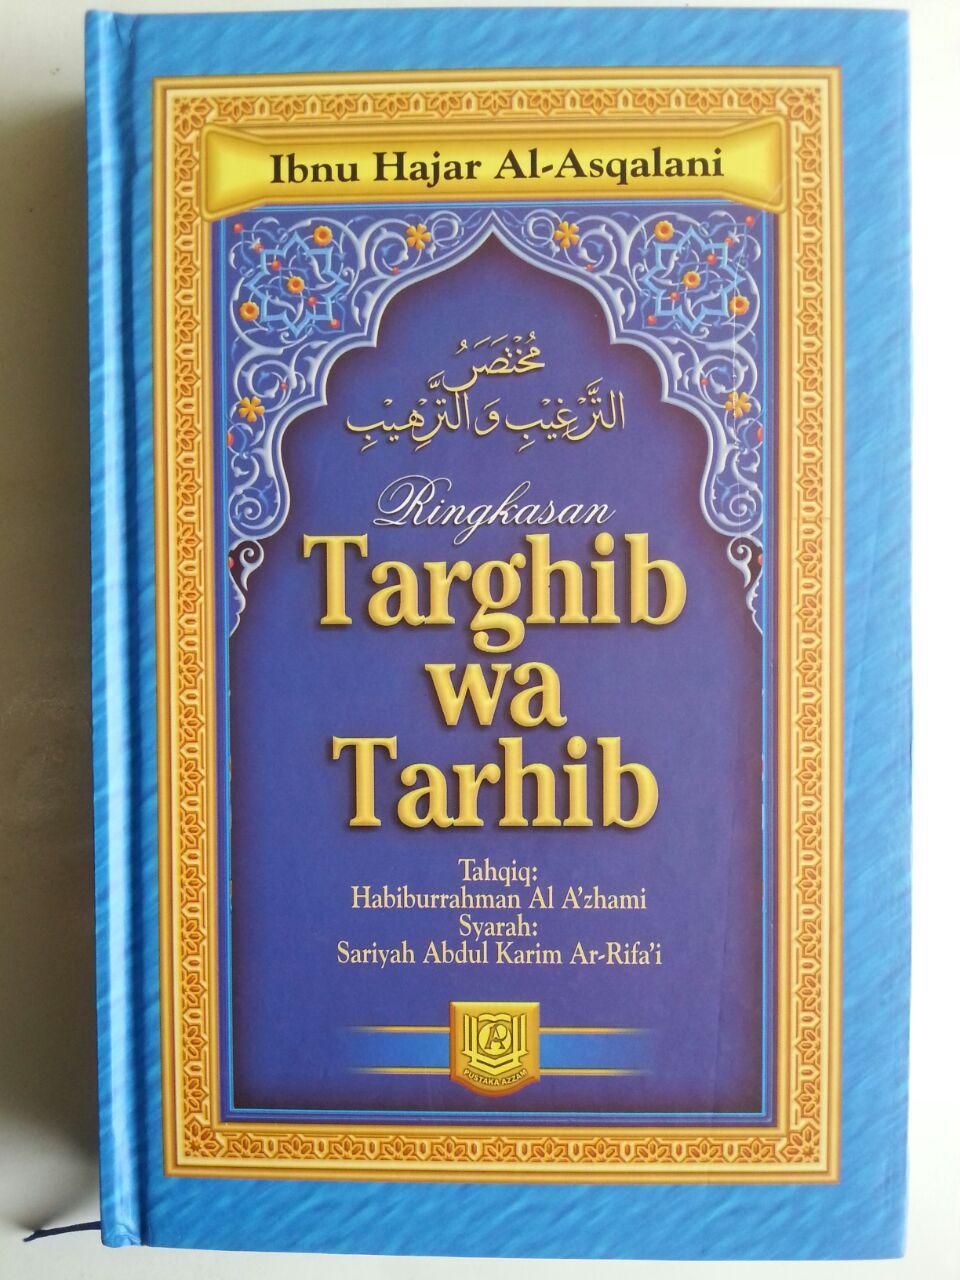 Buku Ringkasan Targhib Wa Tarhib cover 2